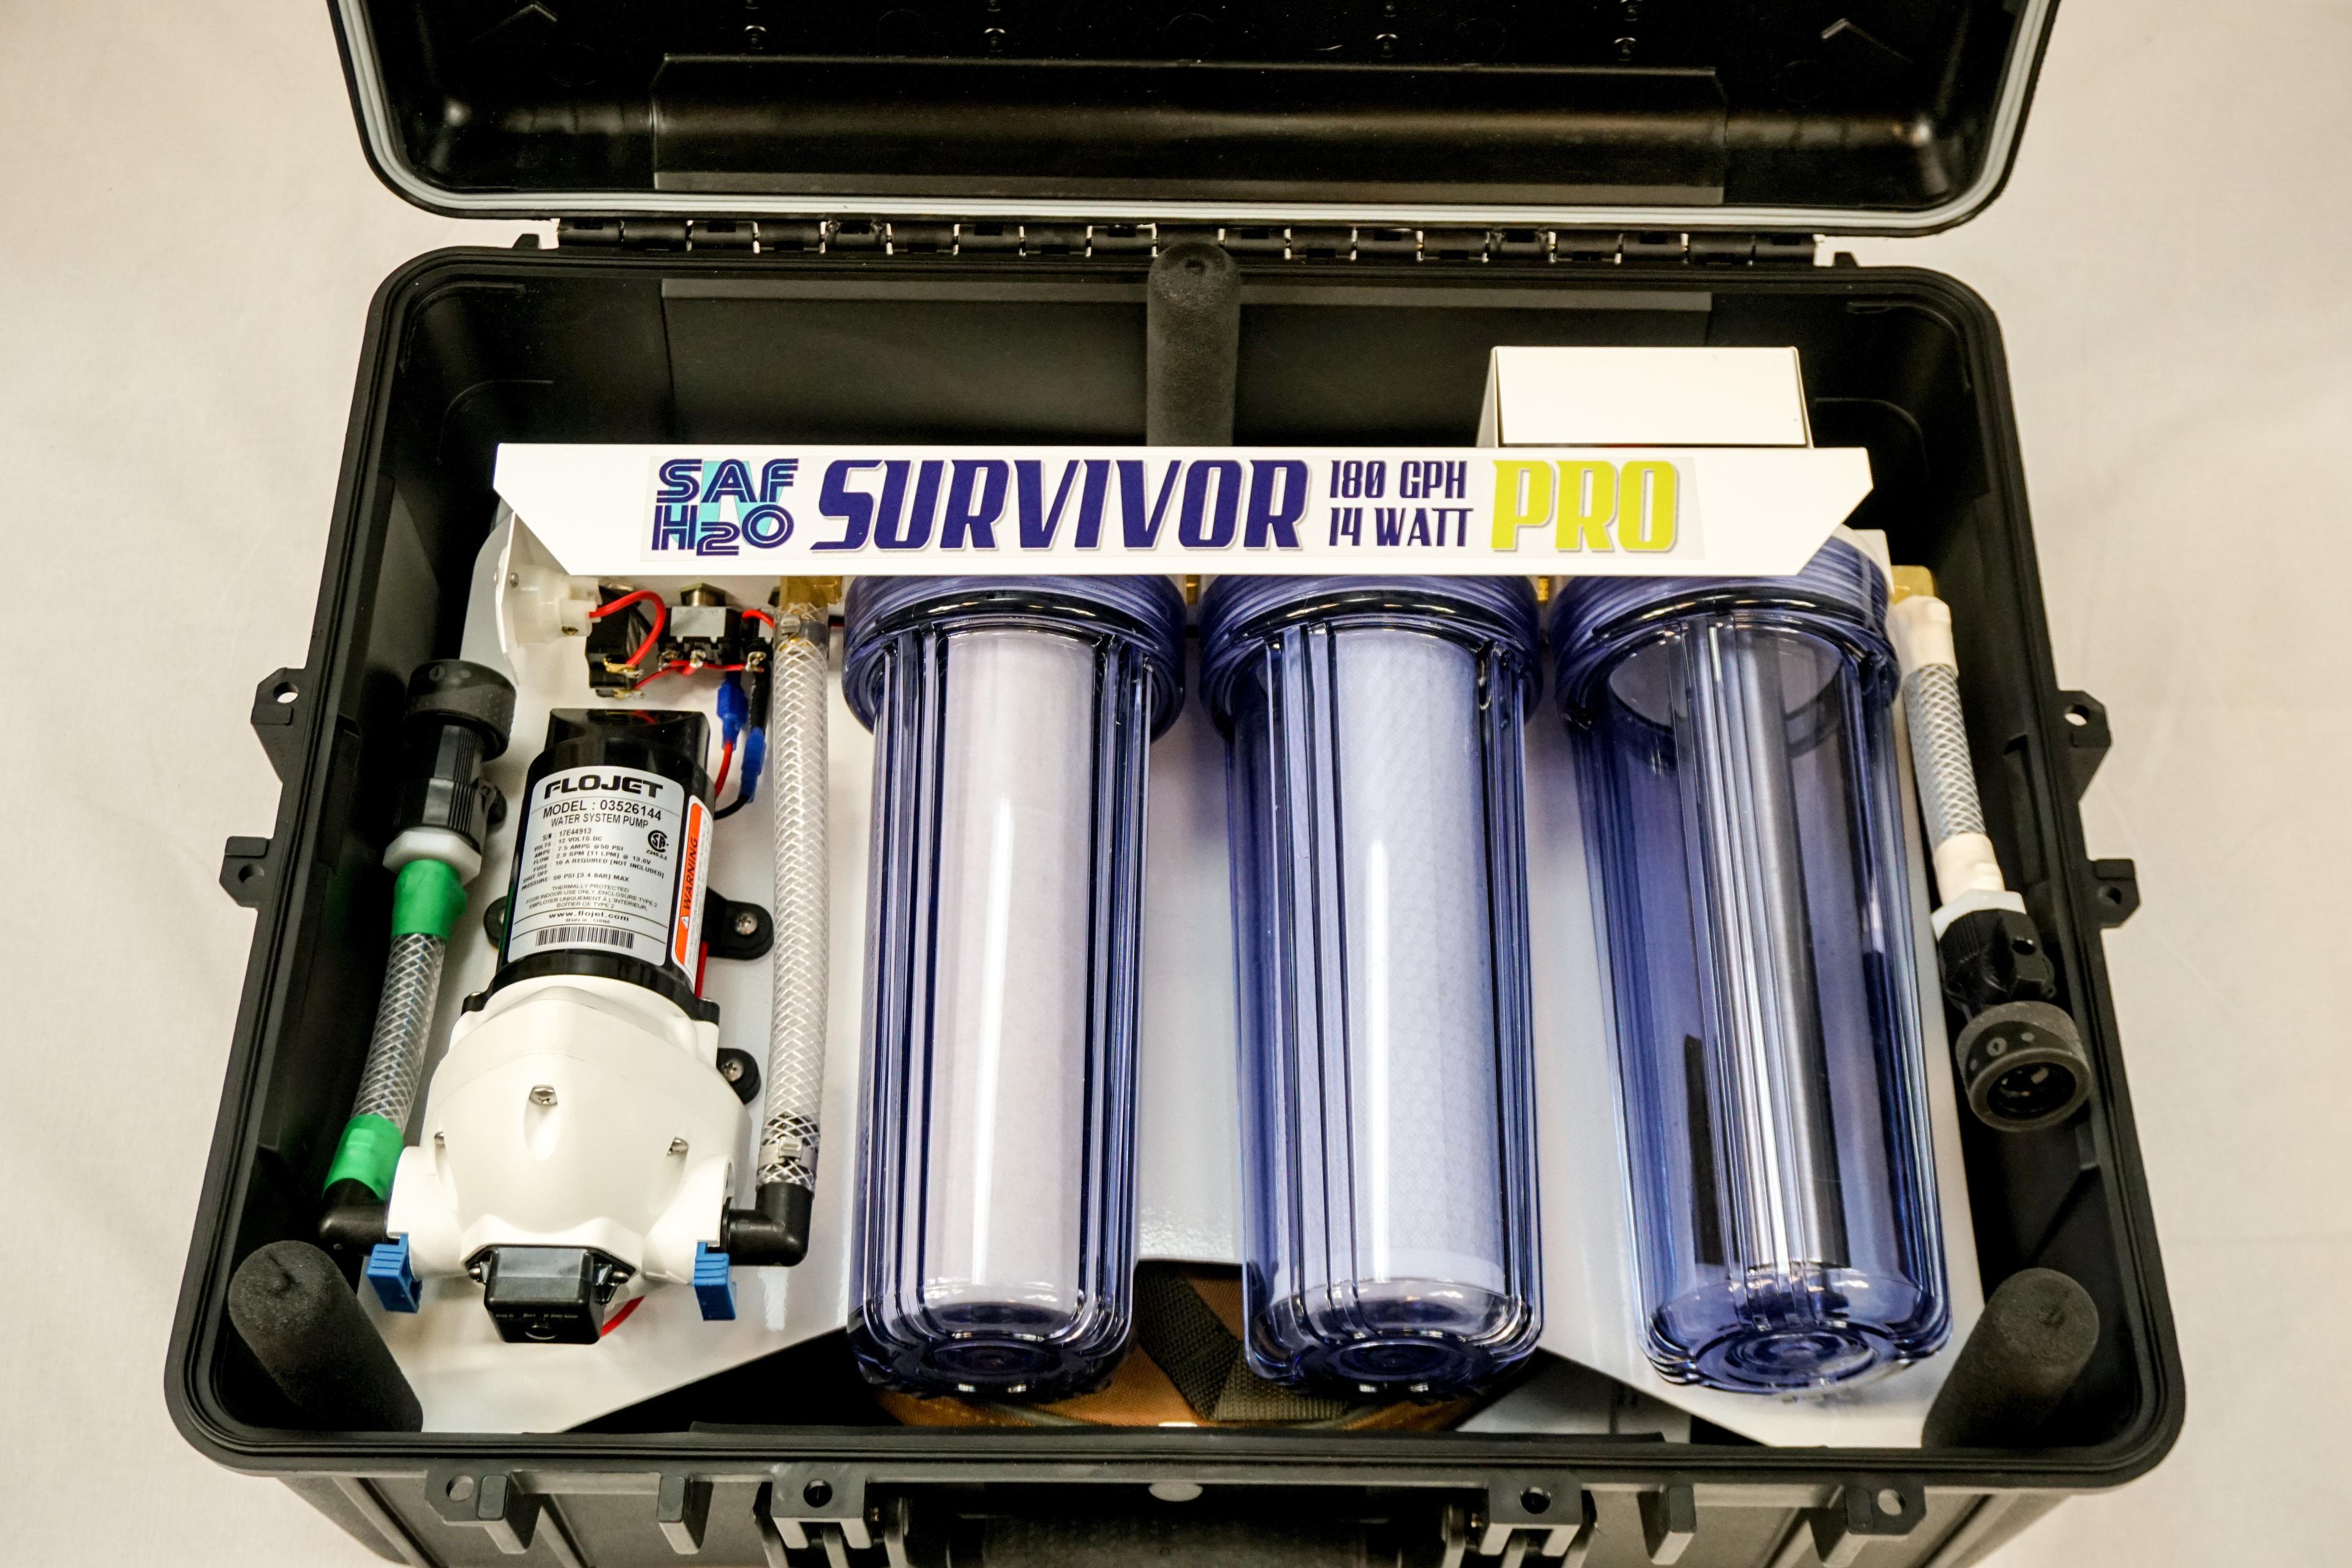 Survivor 12v Portable Water Purification System